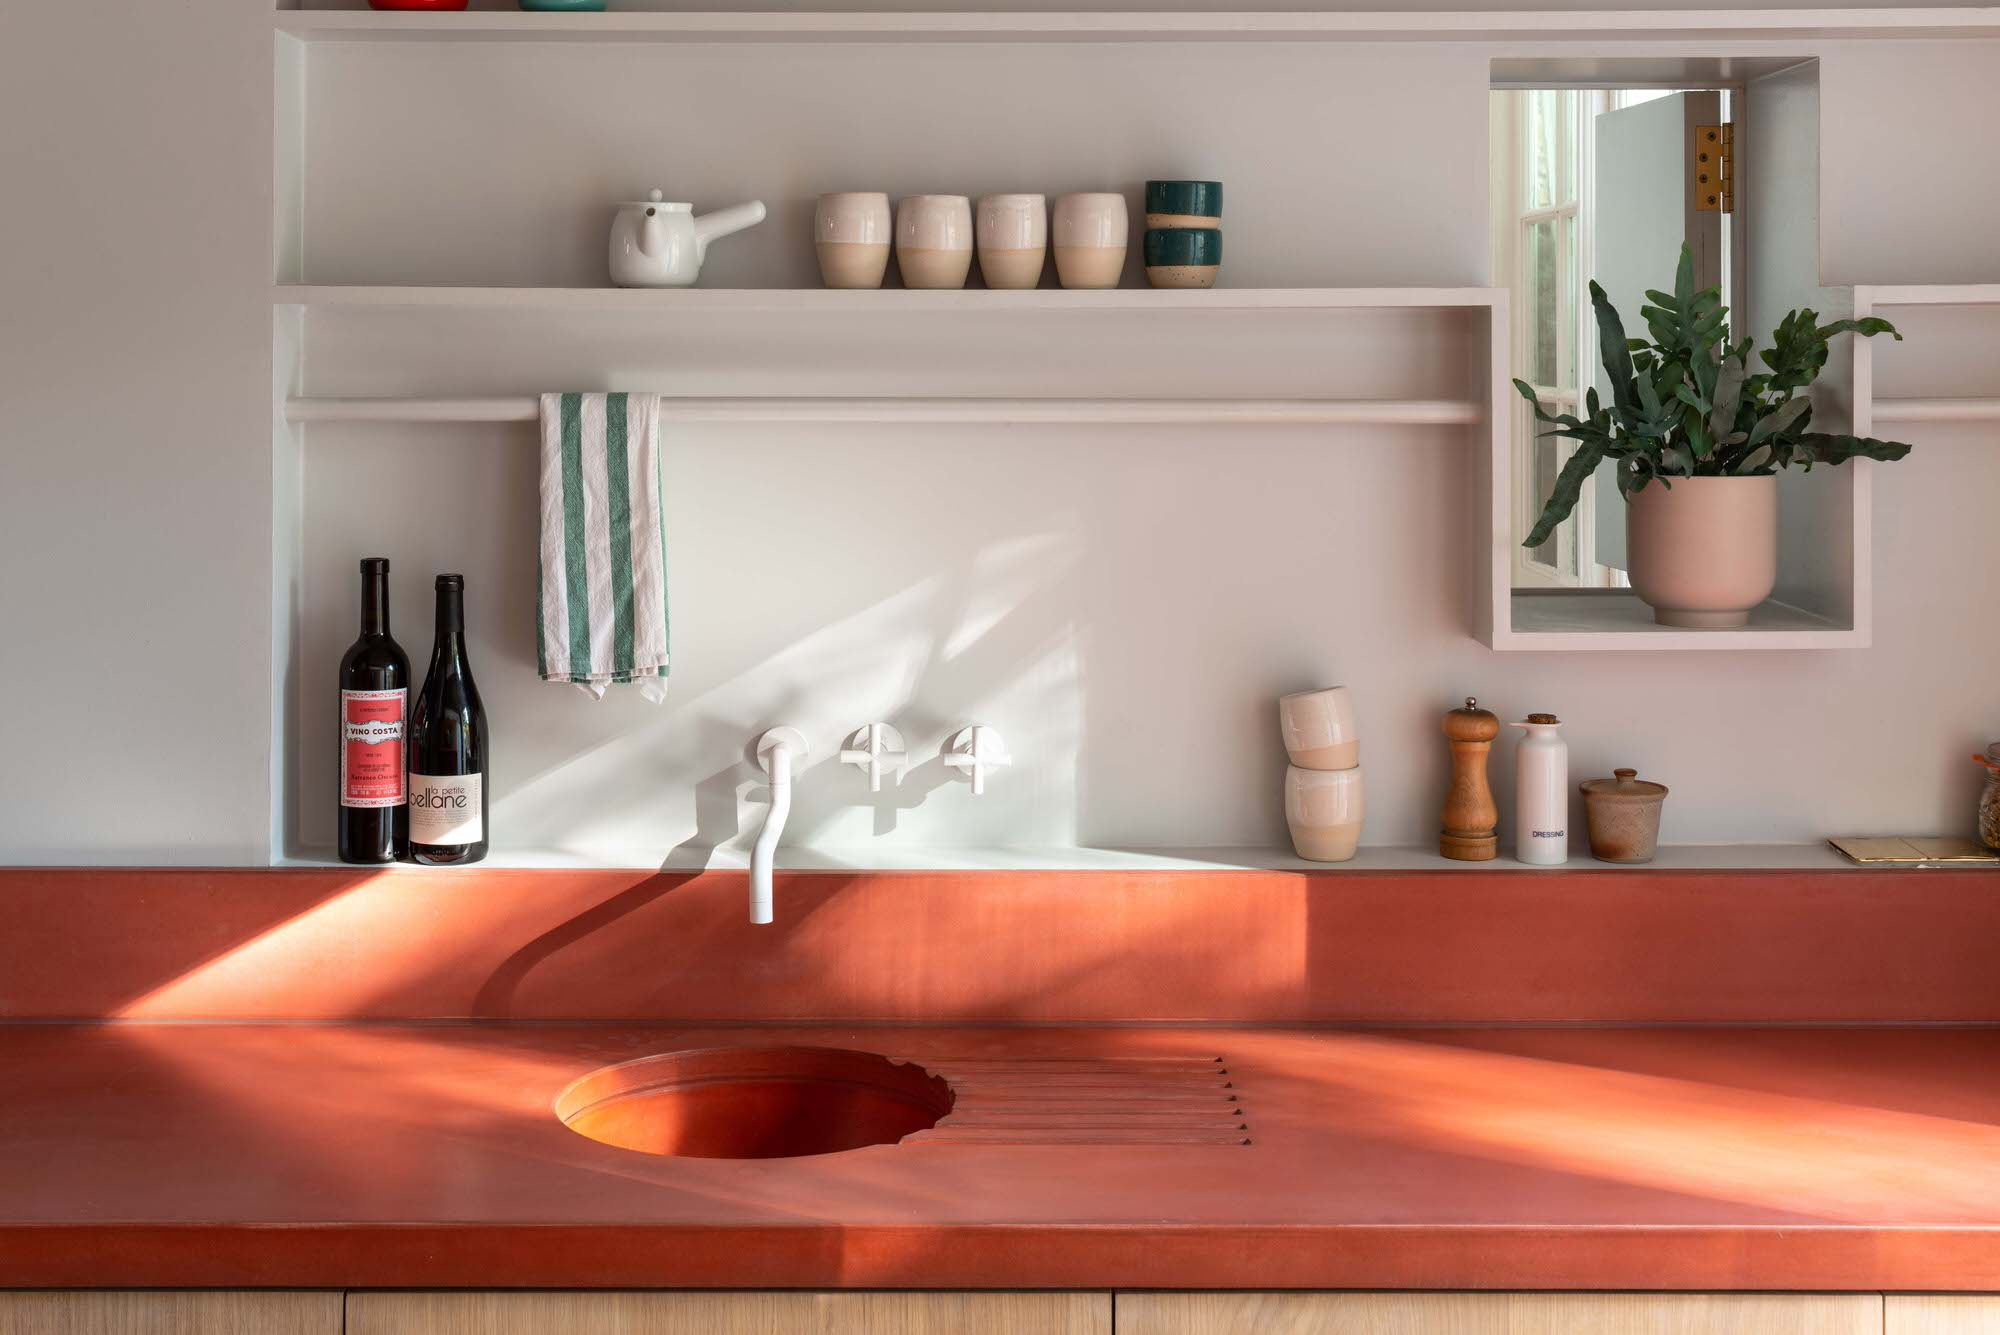 Studio Ben Allen House Recast London Residential Architecture Photo French+tye Yellowtrace 05